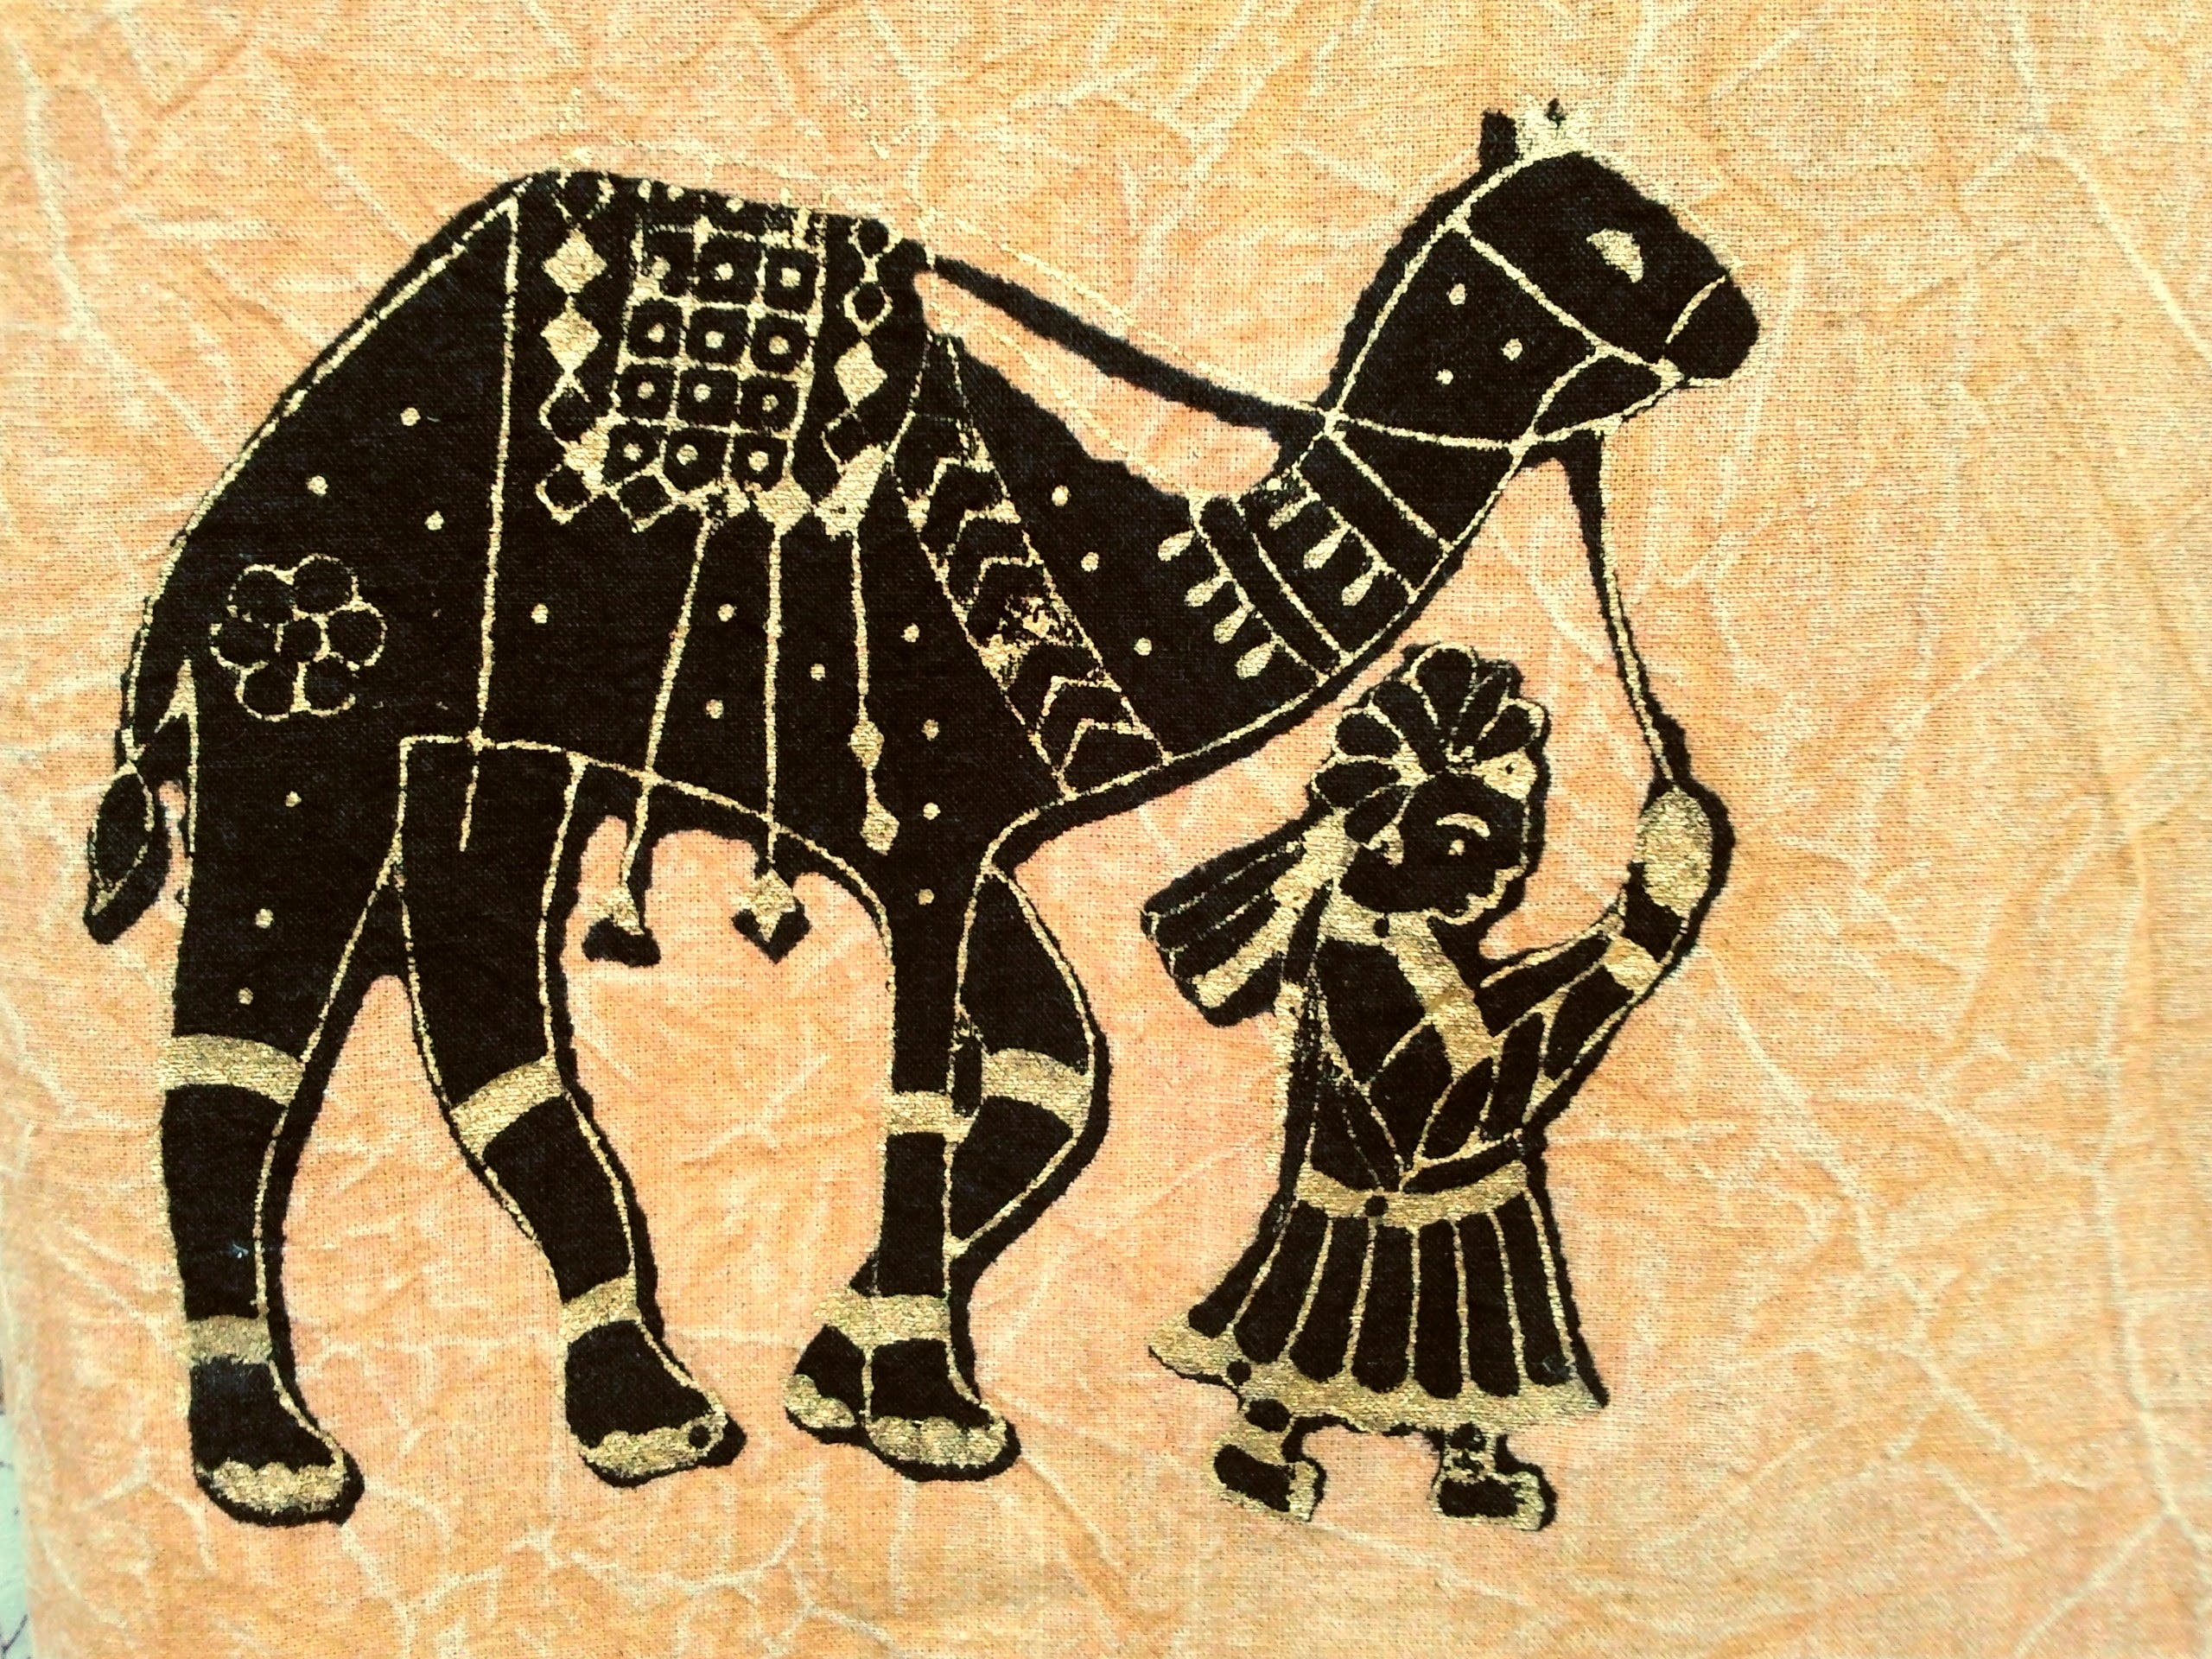 Person Pulling Camel Illustration